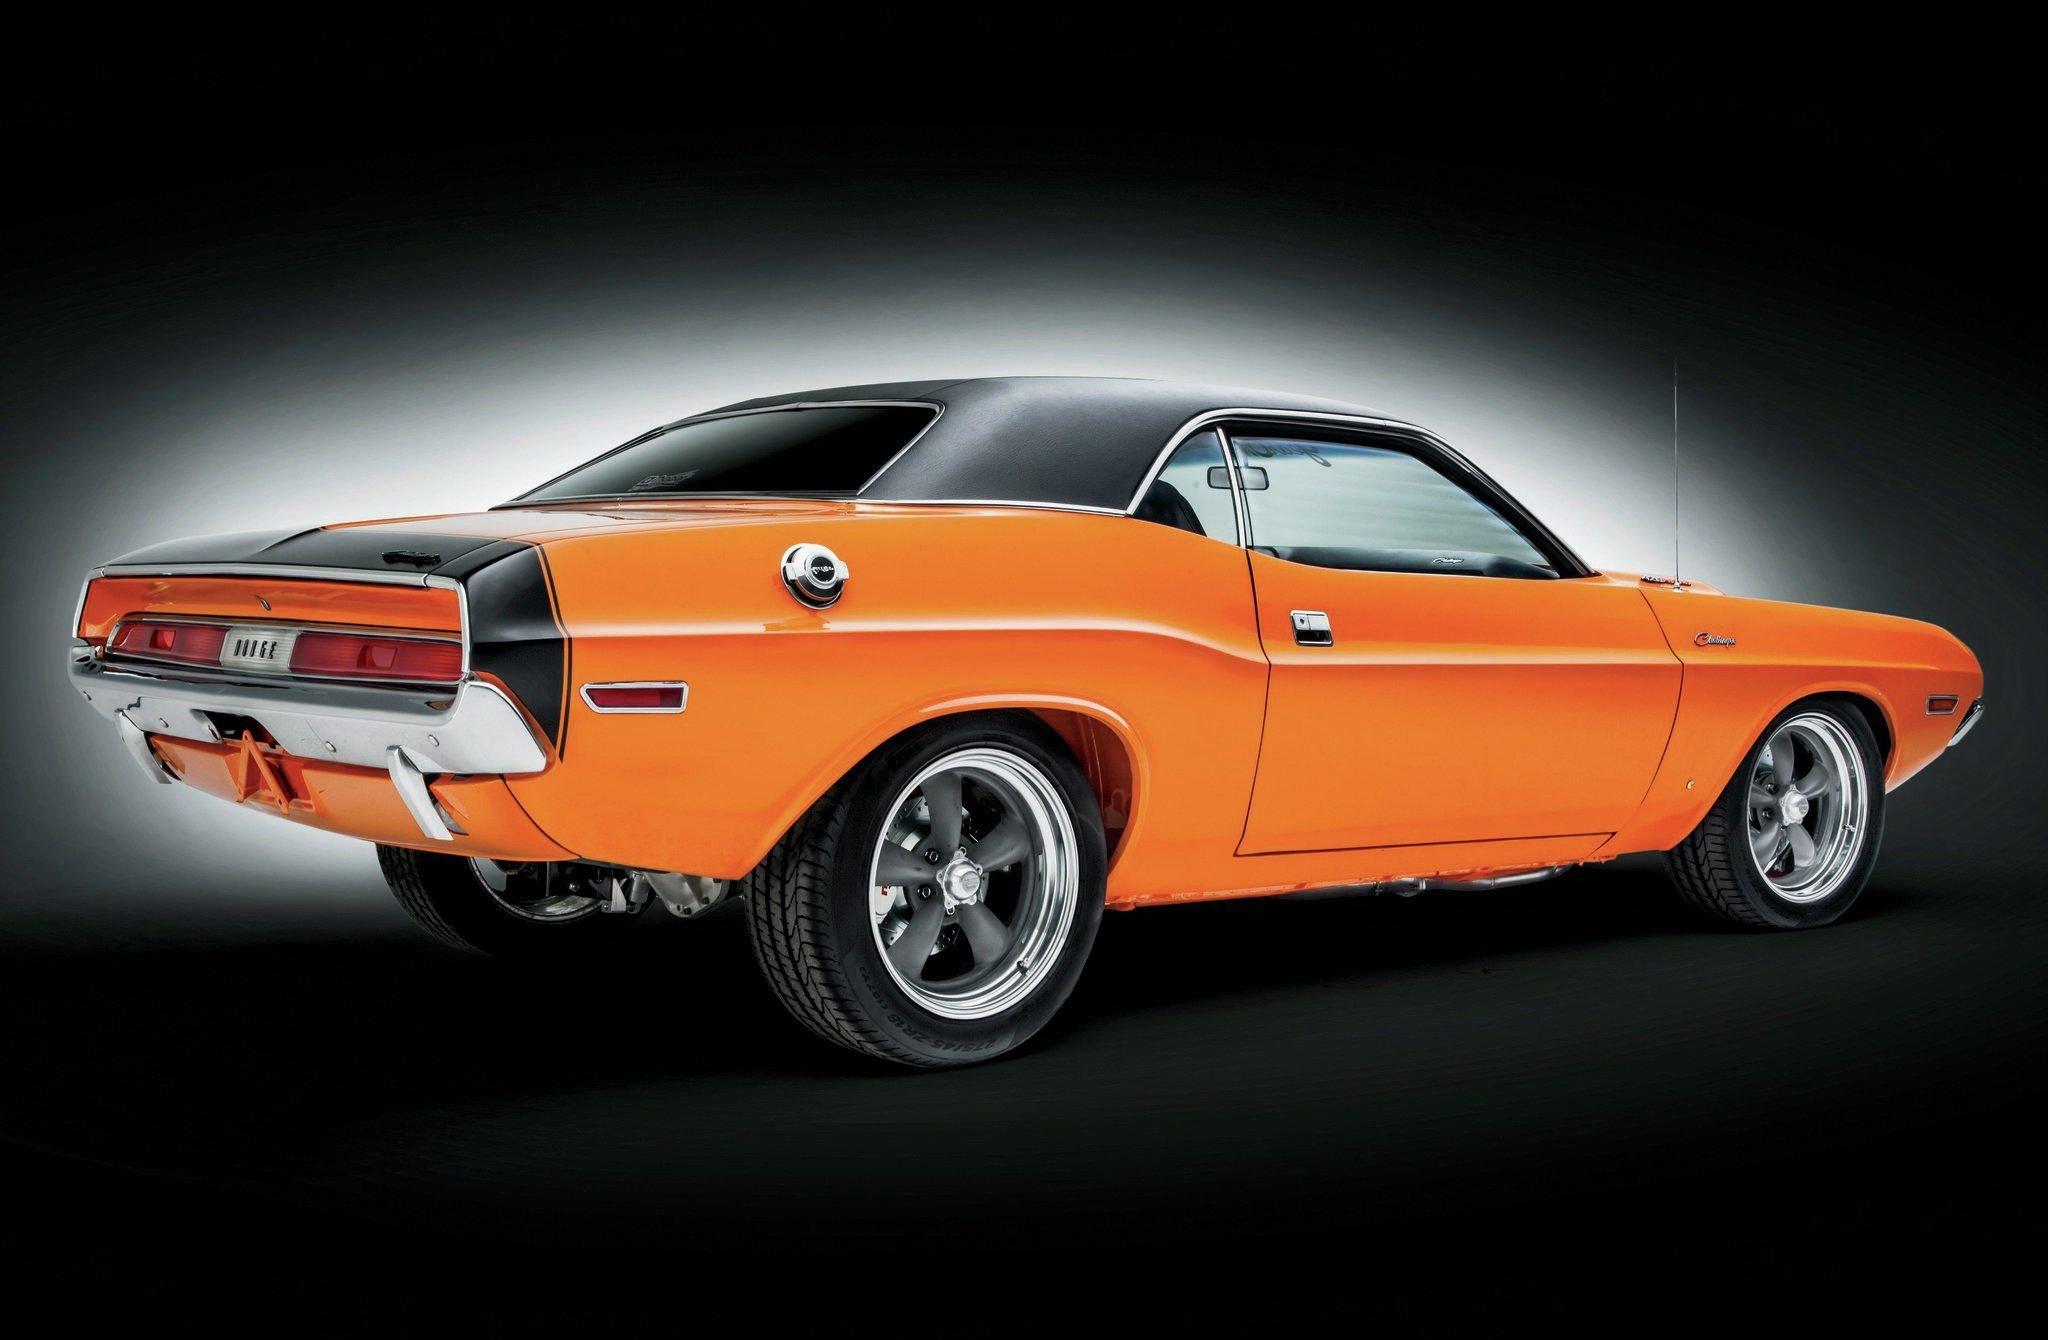 1970 Dodge Challenger RT-03 wallpaper